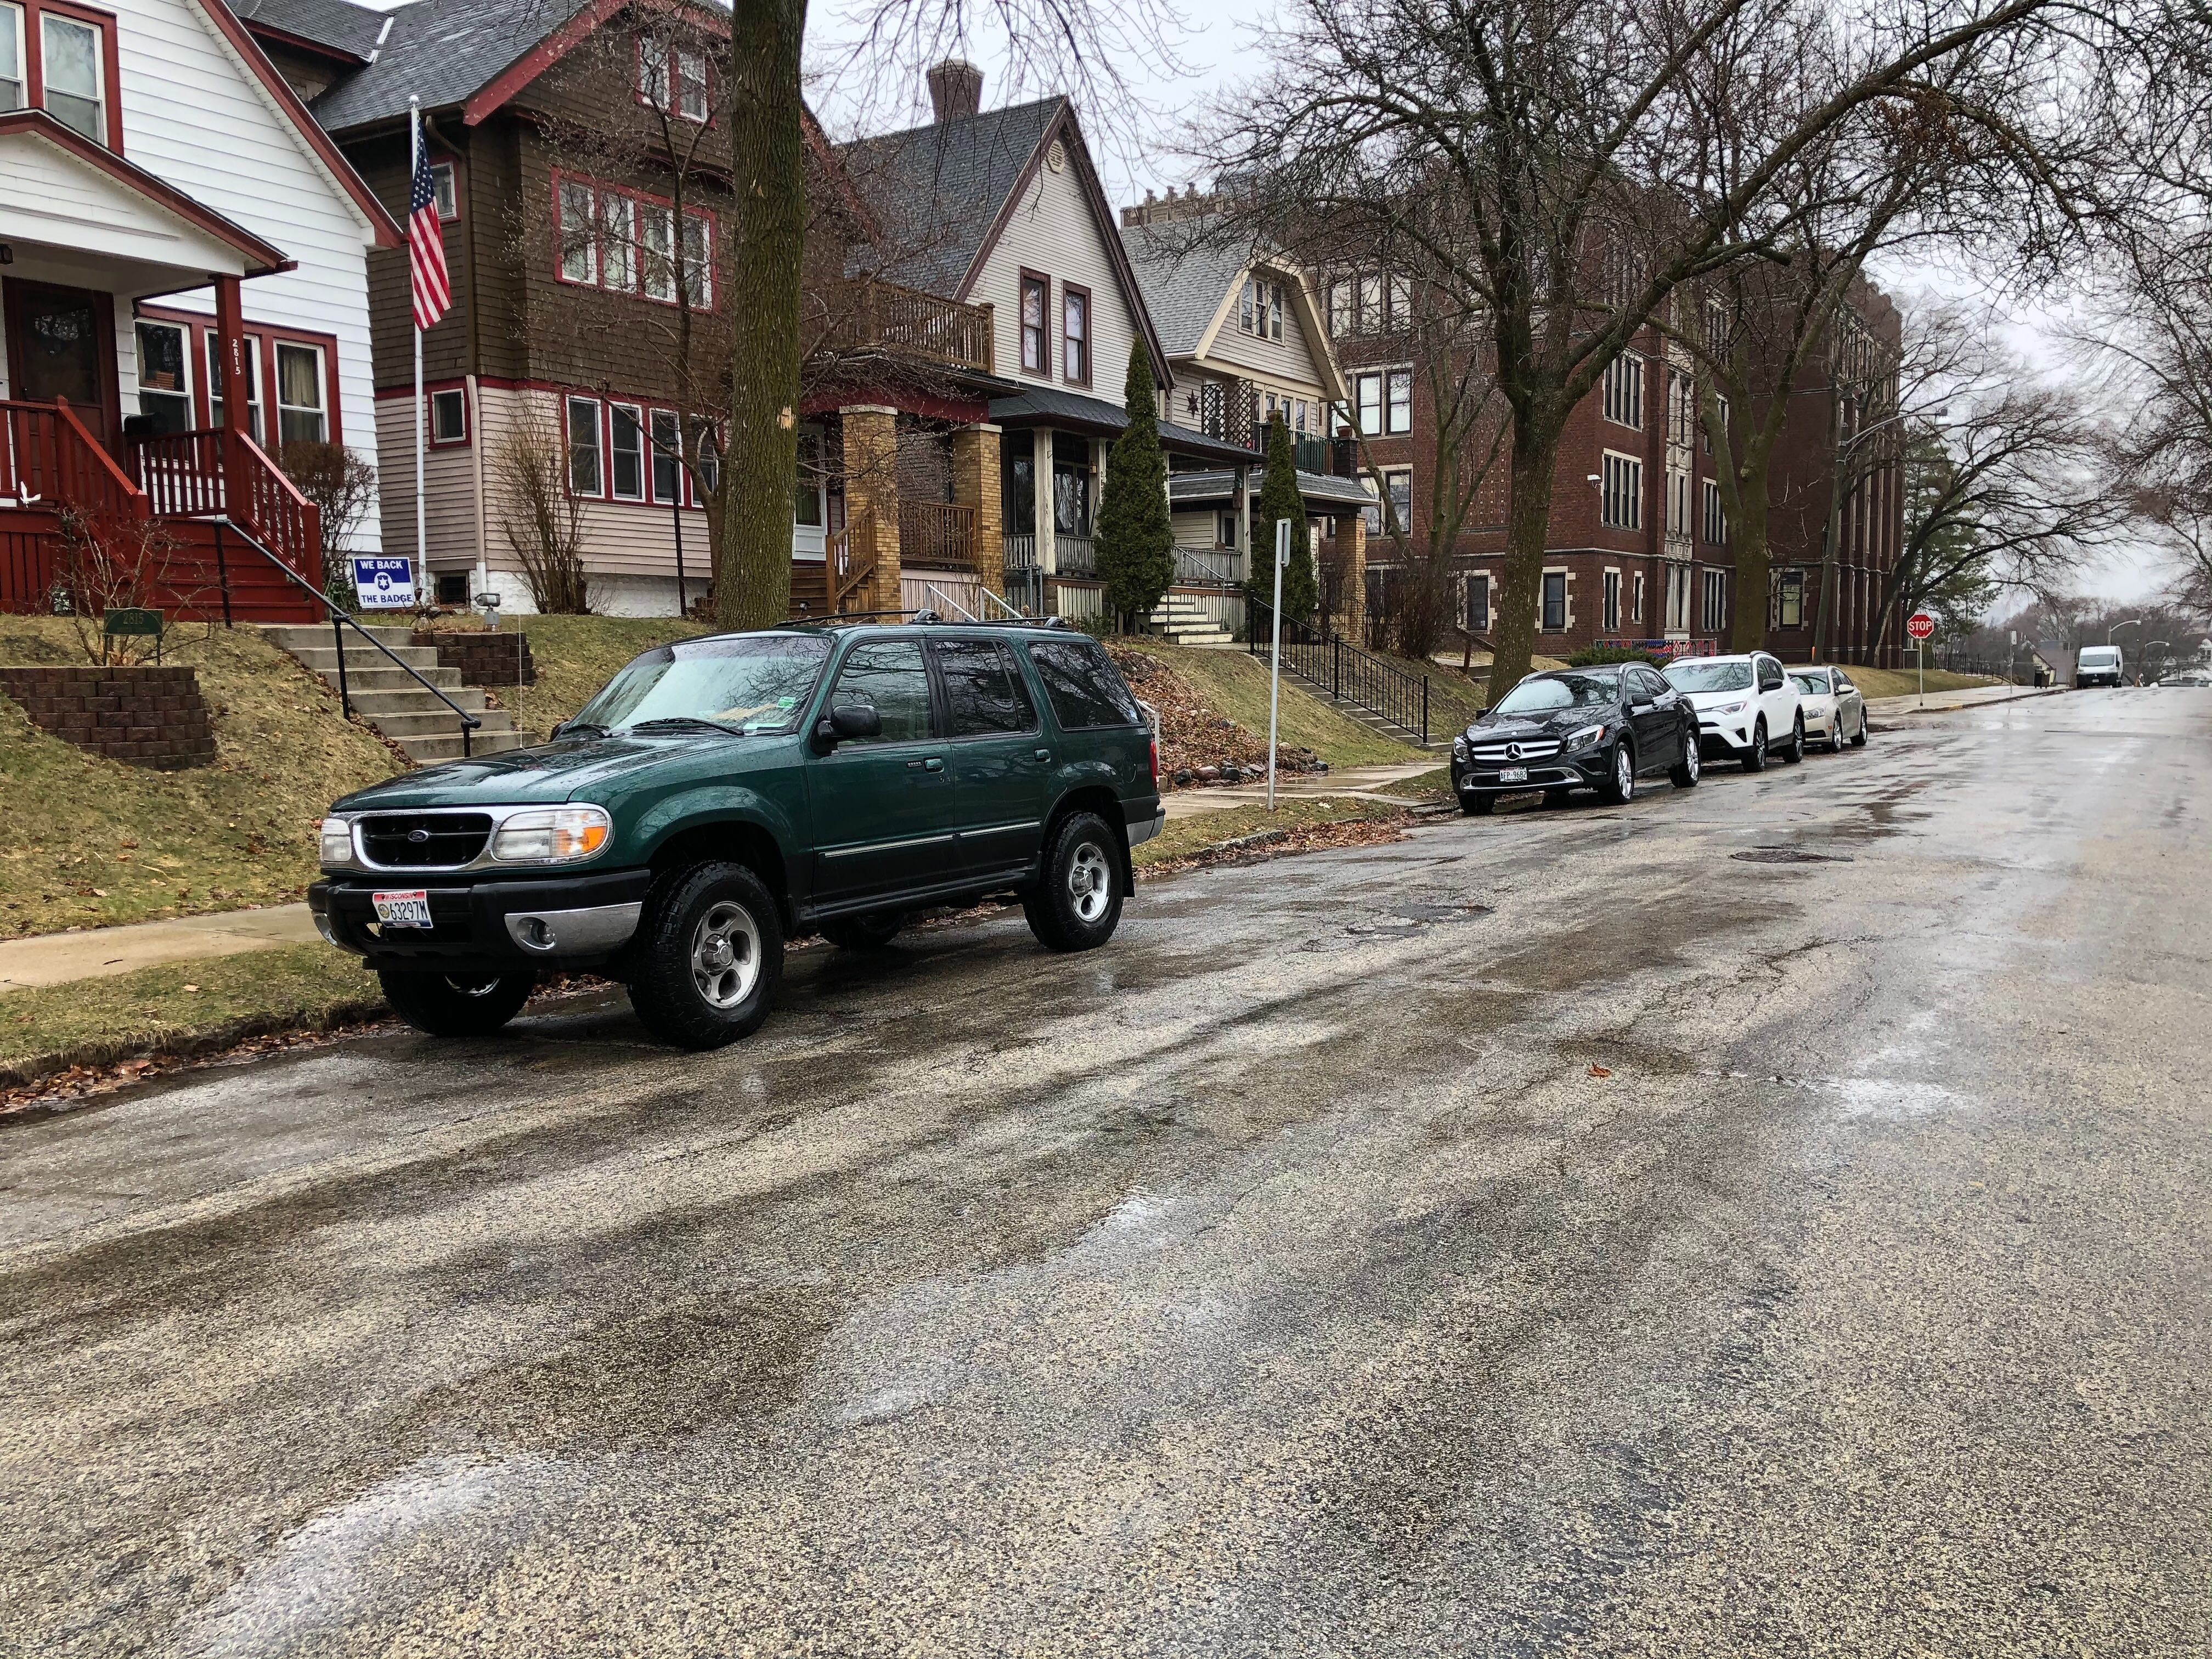 Urban (Coronavirus) Ideas: Suspend Alternate Side Parking For Alternate Side Parking 2020 Calendar